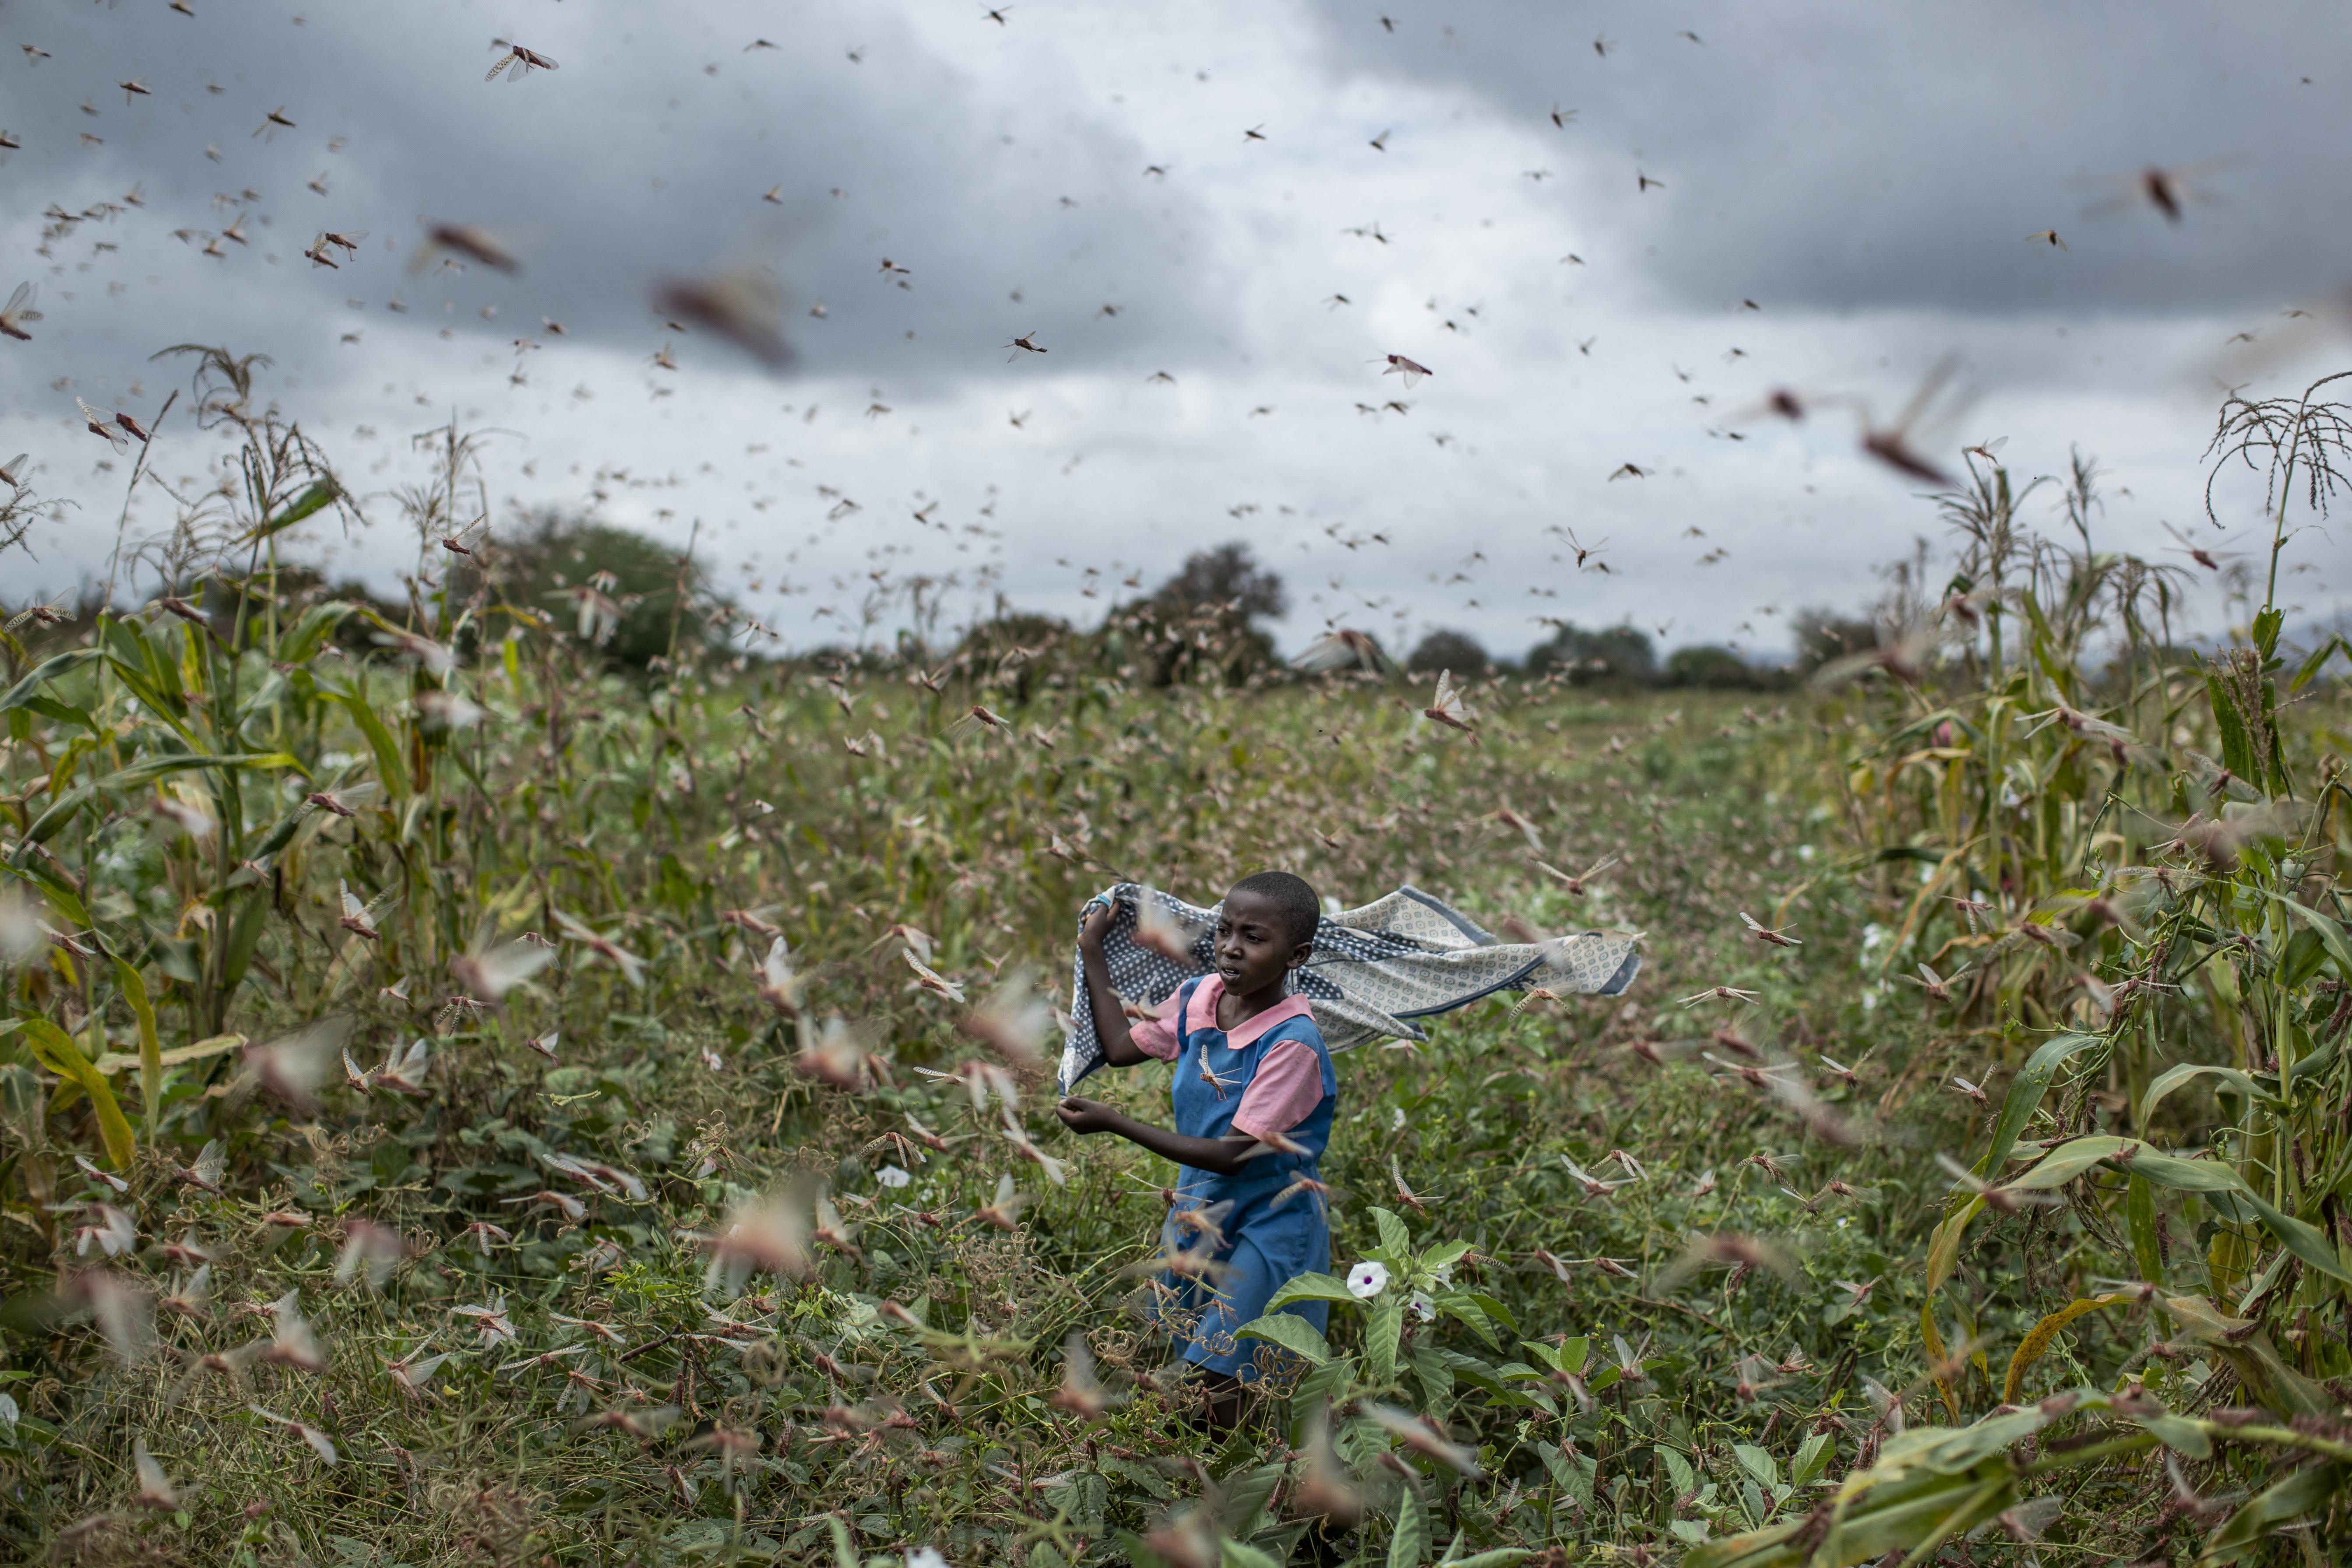 'This Is Huge': Worst Locust Swarm in Decades Destroy Crops in East Africa